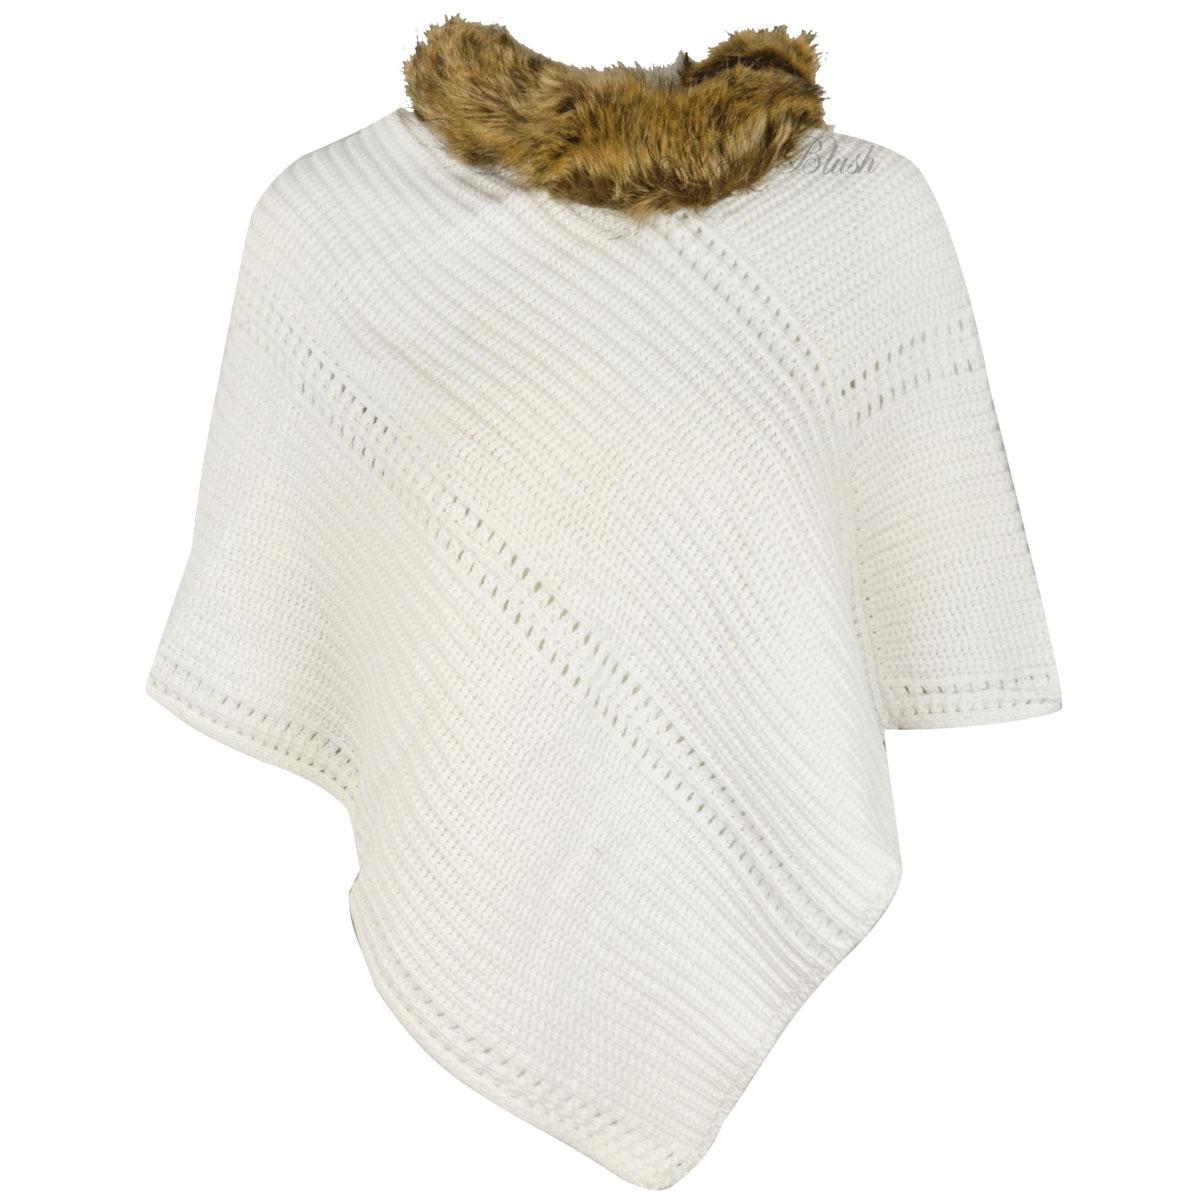 Cape Jumper Knitting Pattern : Girls Kids Knitted Poncho Fur Collar Cape Shawl Winter Jumper Sweater Top Siz...